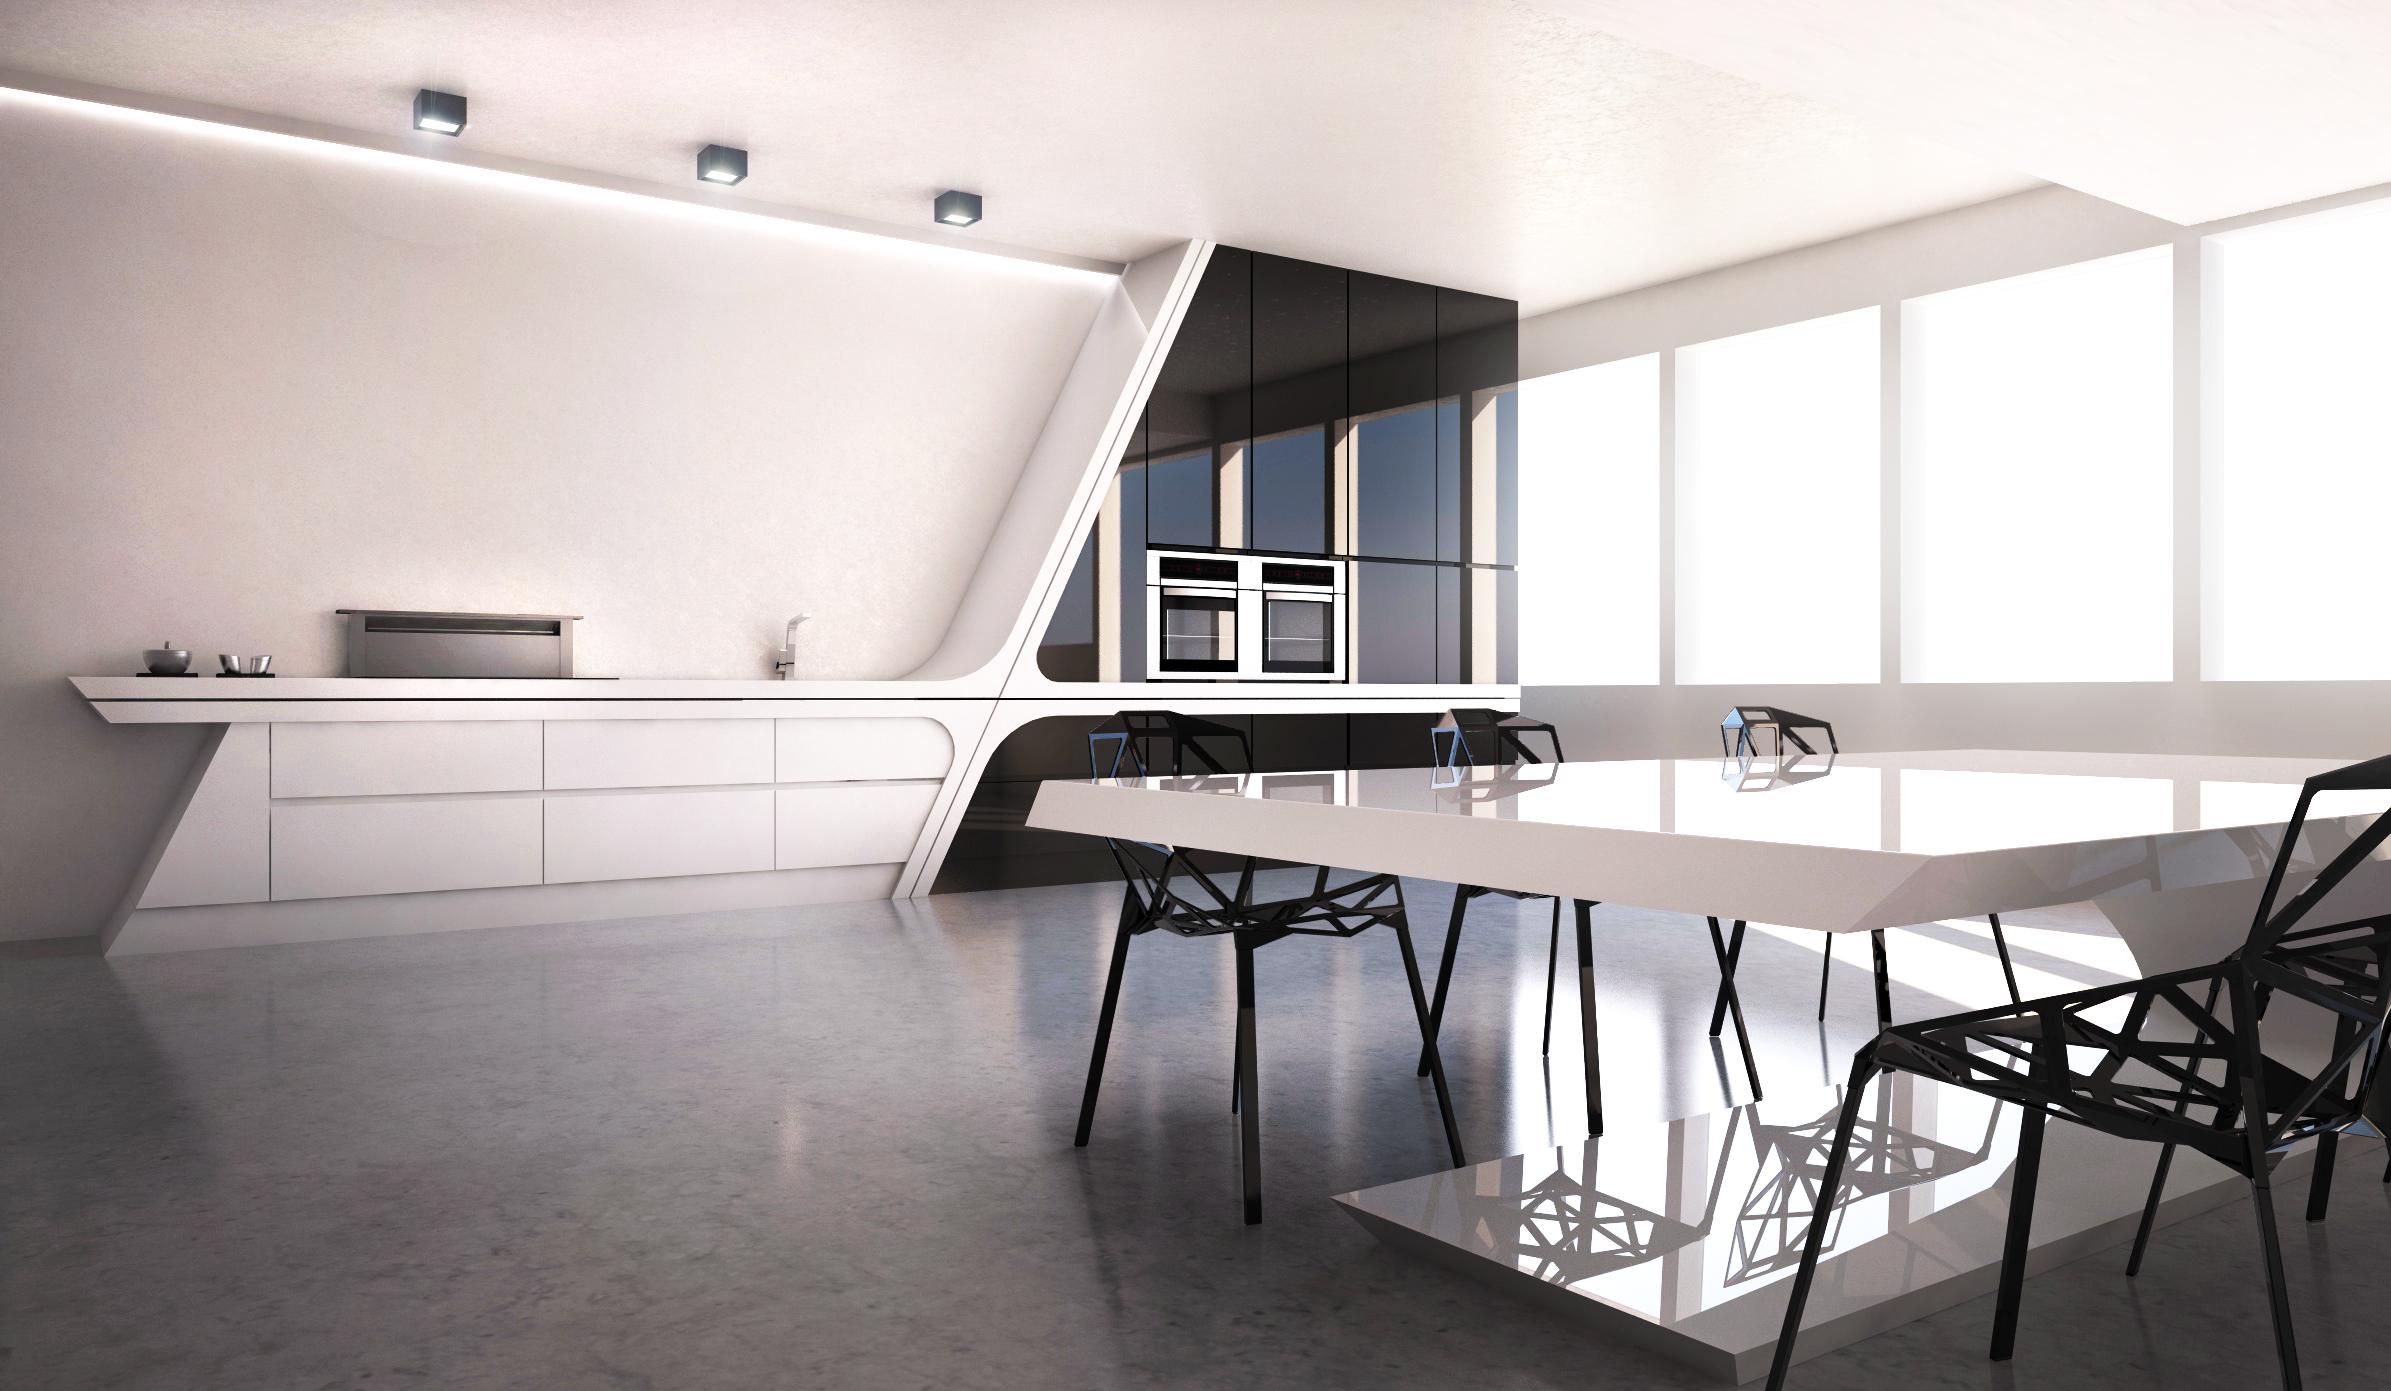 vivienda diseño pozuelo de alarcon 1